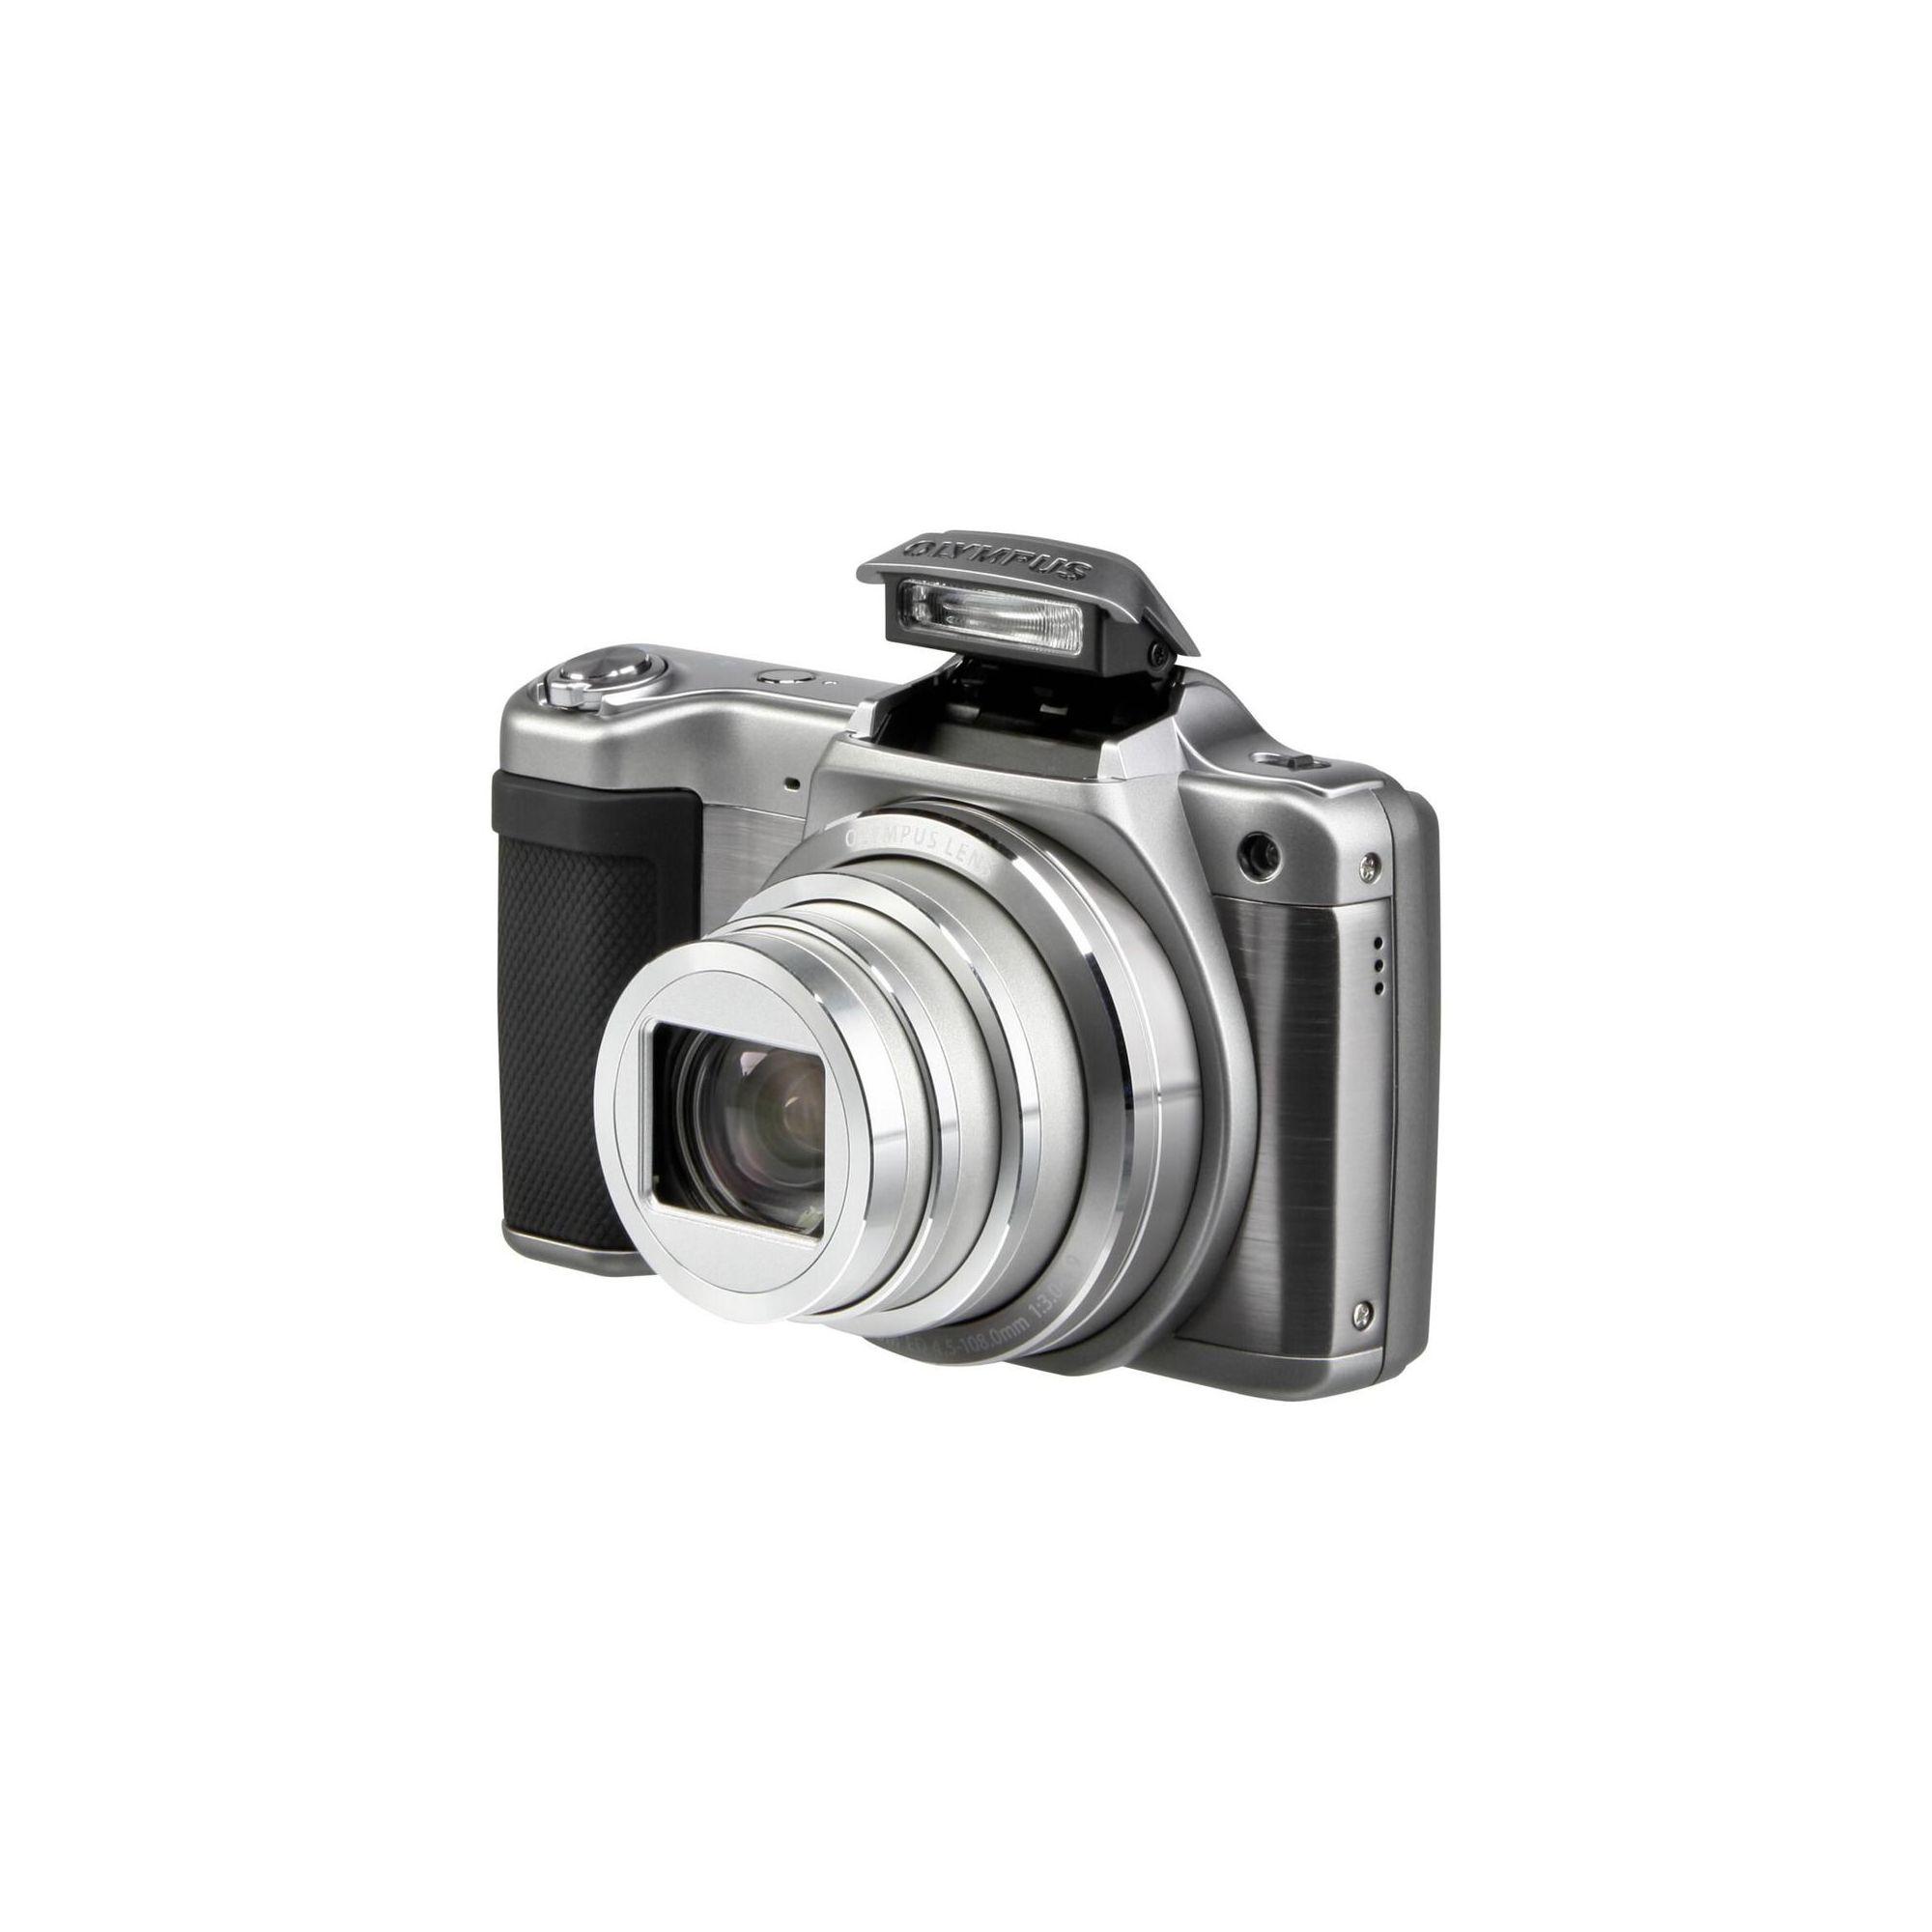 Olympus SZ-15 Compact Digital Camera in Silver